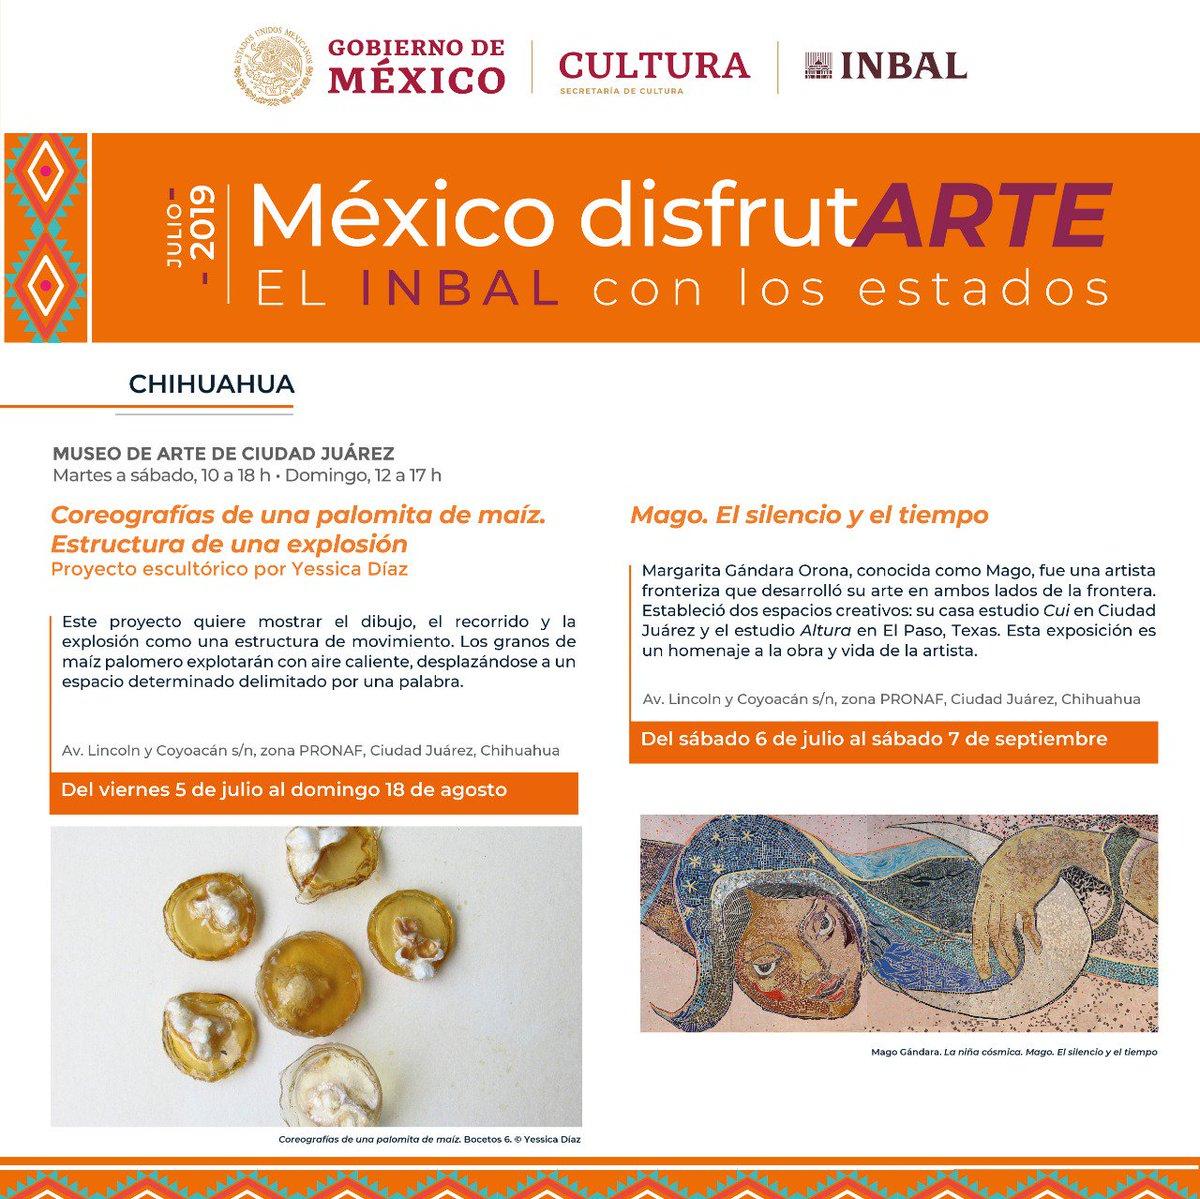 CD EME X Ciudad de México on Twitter: